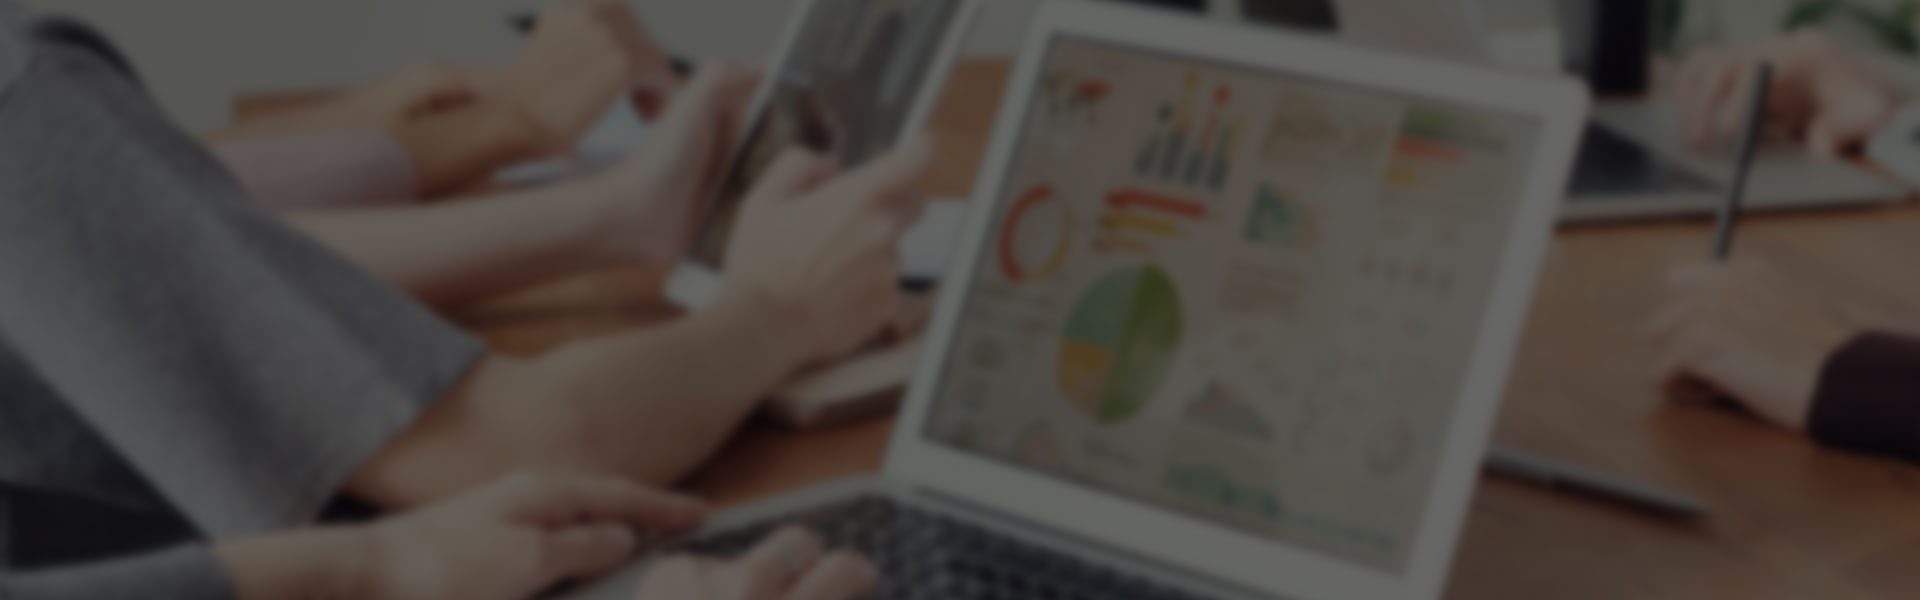 Microsoft Dynamics 365 CRM - Infinite Staffing Solutions